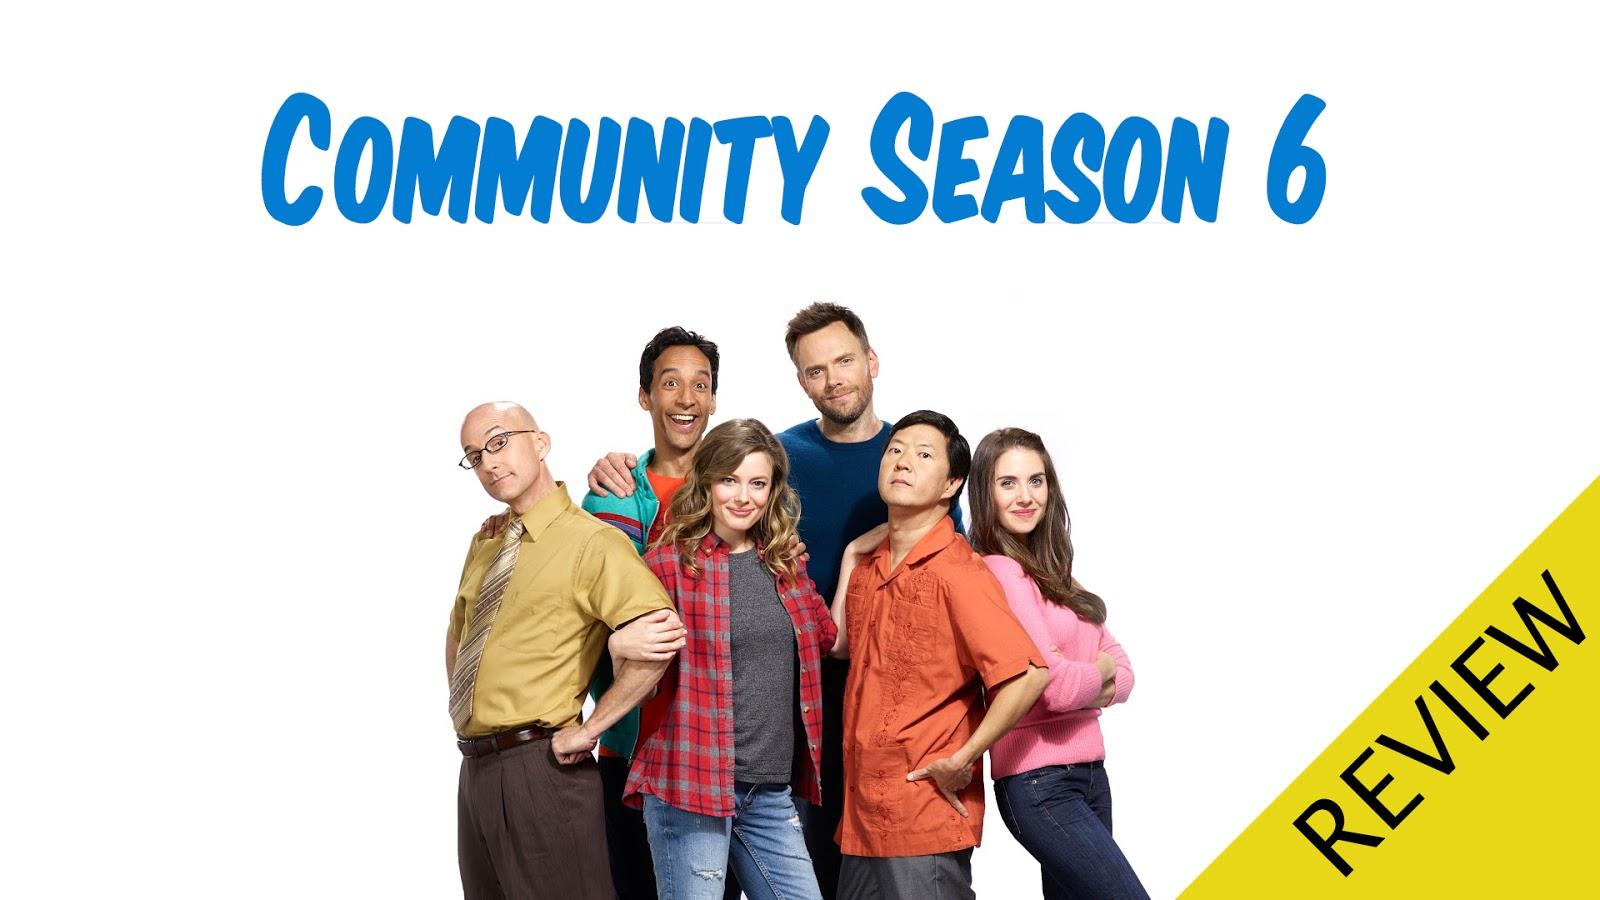 REVIEW - Community: Season 6 Episode 3